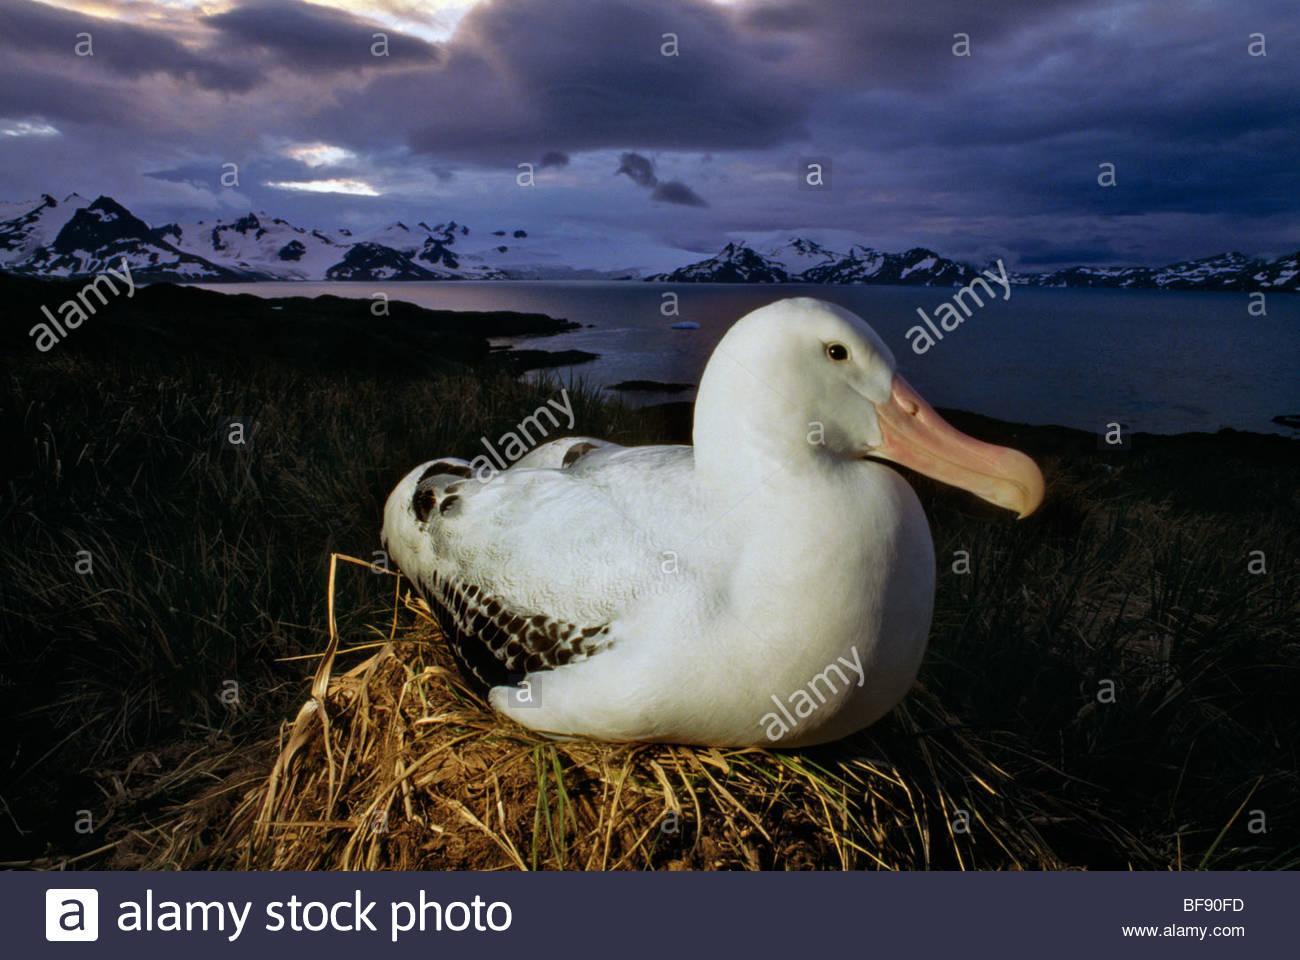 Wandering albatross on nest, Diomedea exulans, South Georgia Island - Stock Image